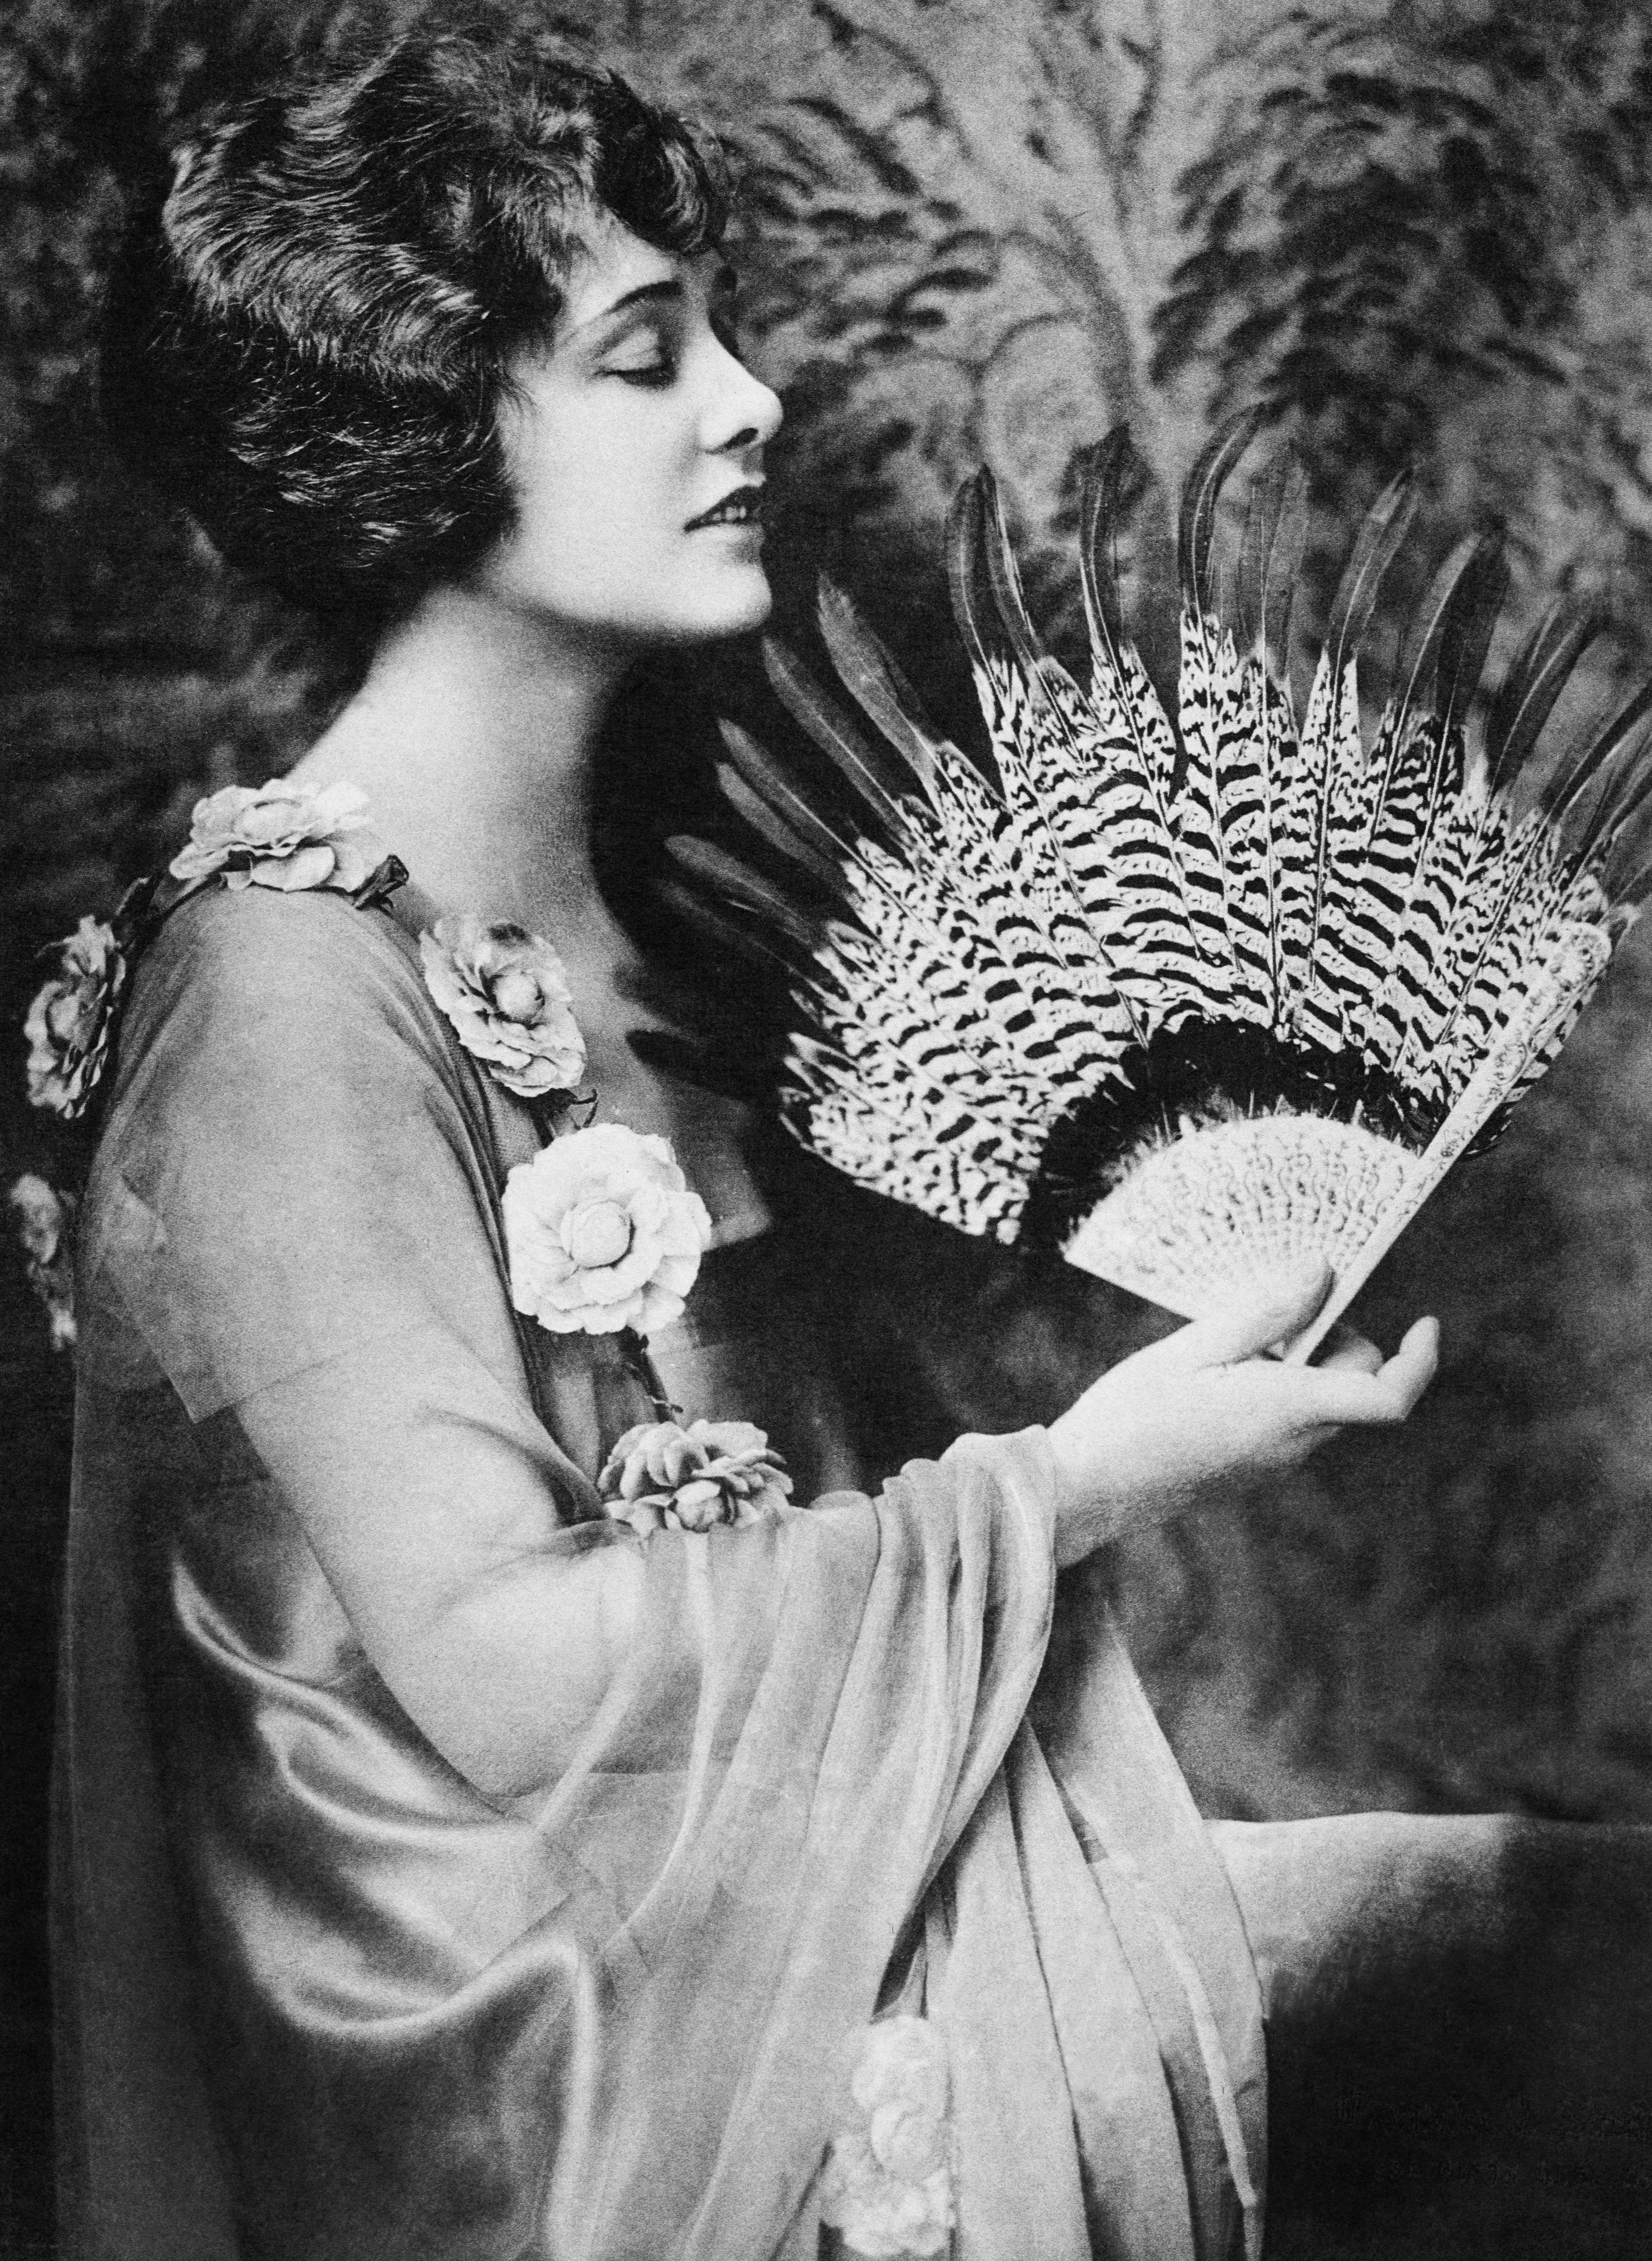 Mandatory Credit: Photo by Everett/REX/Shutterstock (952066a) Profile of a woman fanning herself Profile of a woman fanning herself